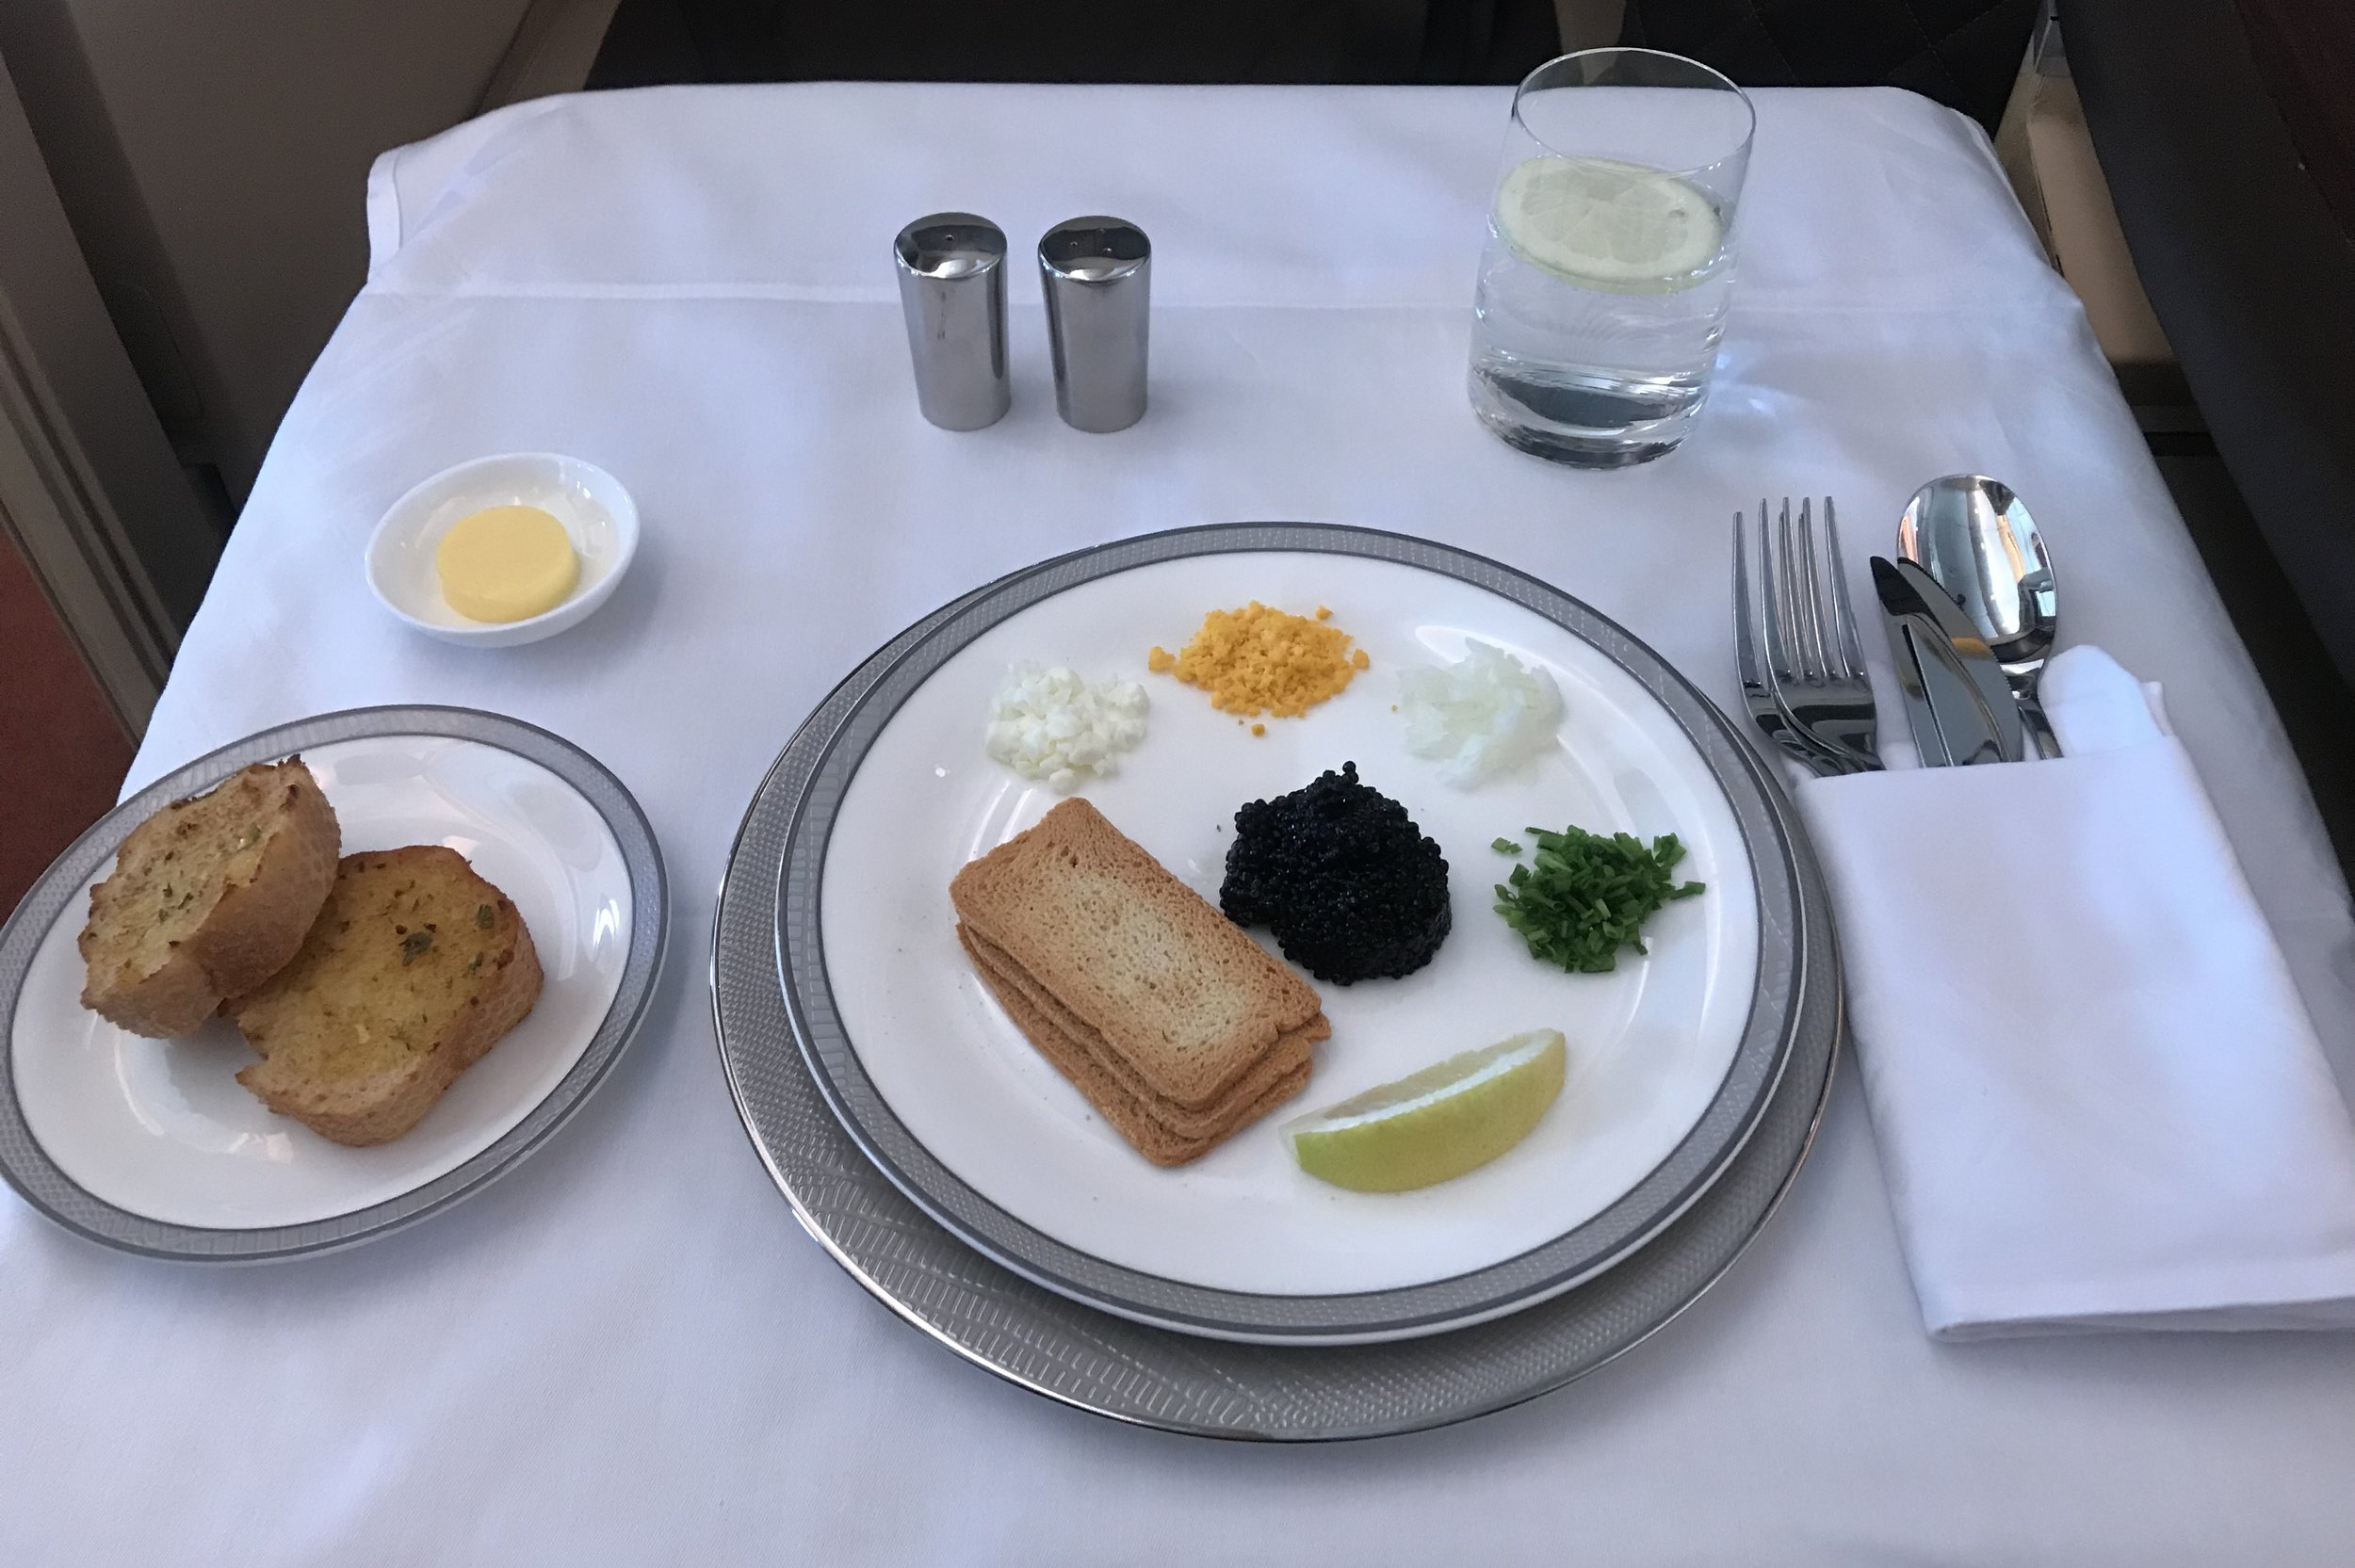 Singapore Airlines Suites Class – Caviar